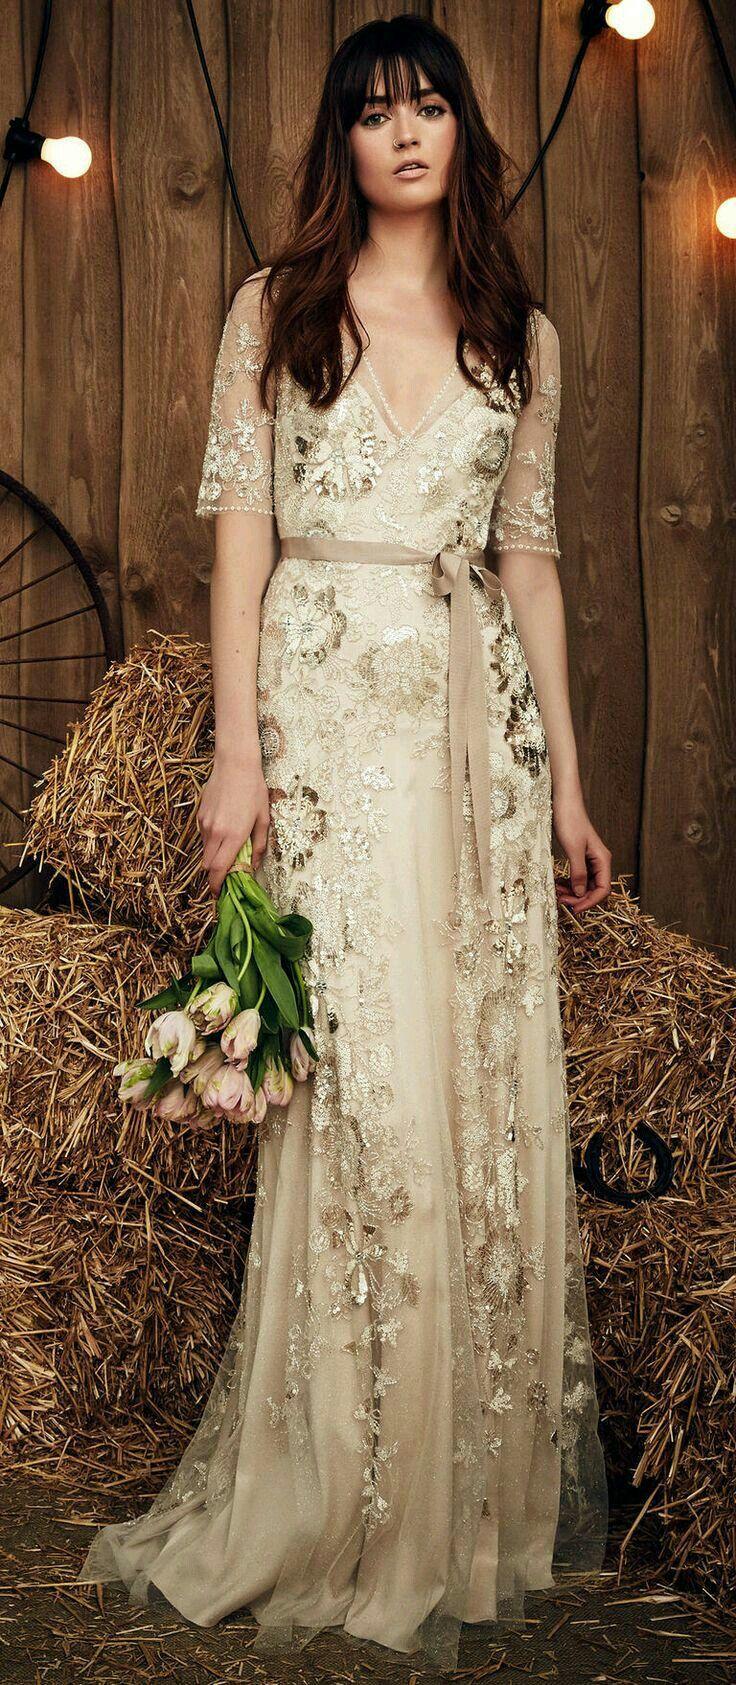 Pin by claire disley on wedding pinterest wedding dress wedding